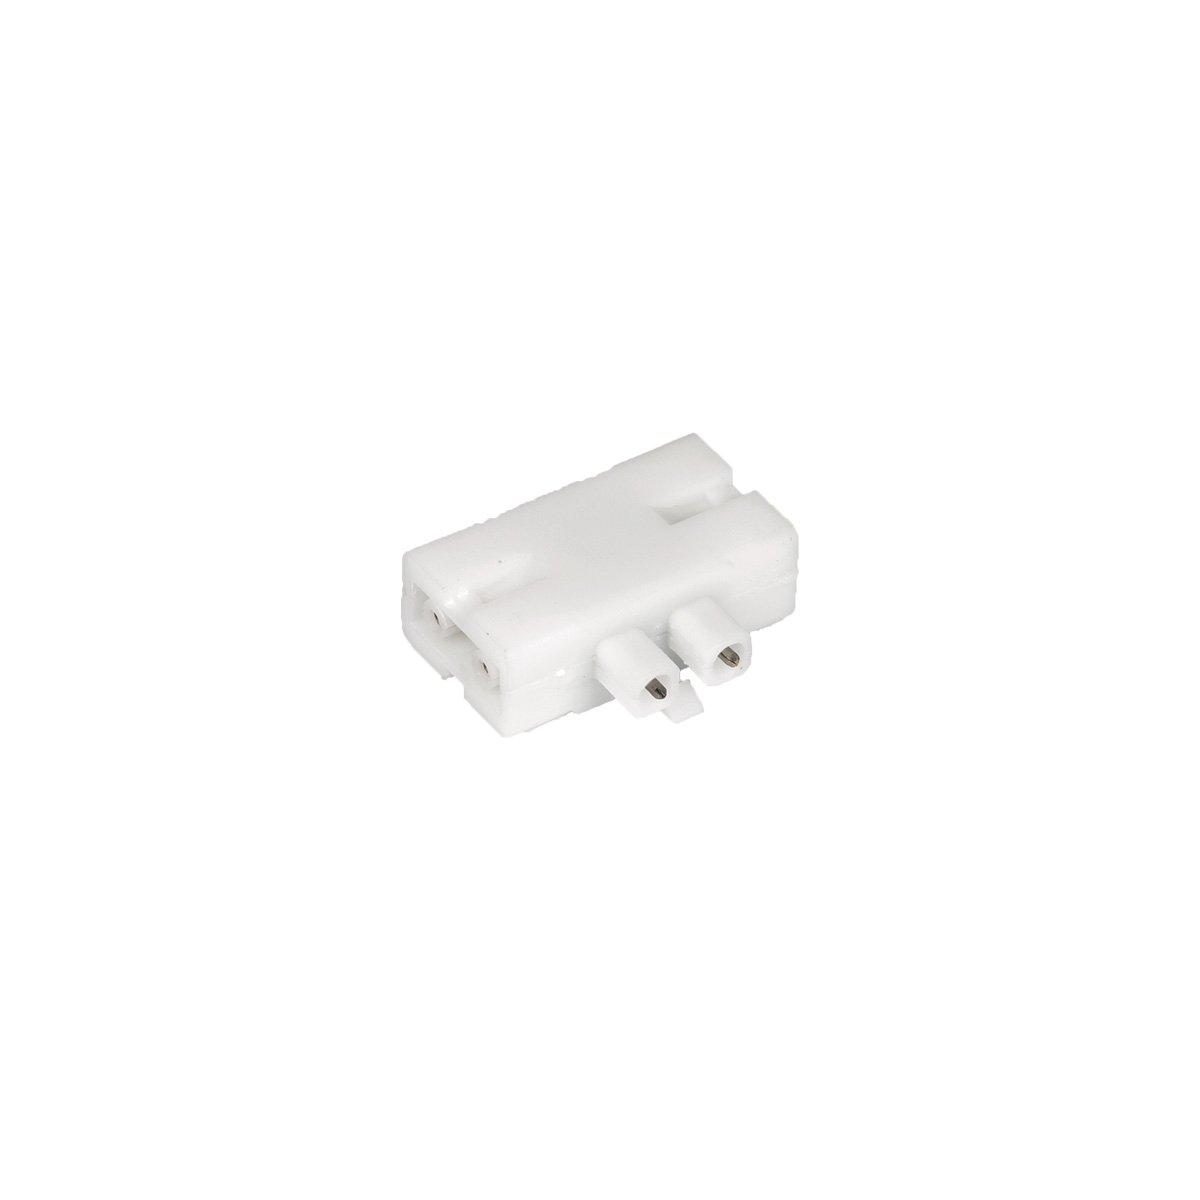 WAC Lighting LED-HVT-T-WT Flexline T Connector, White